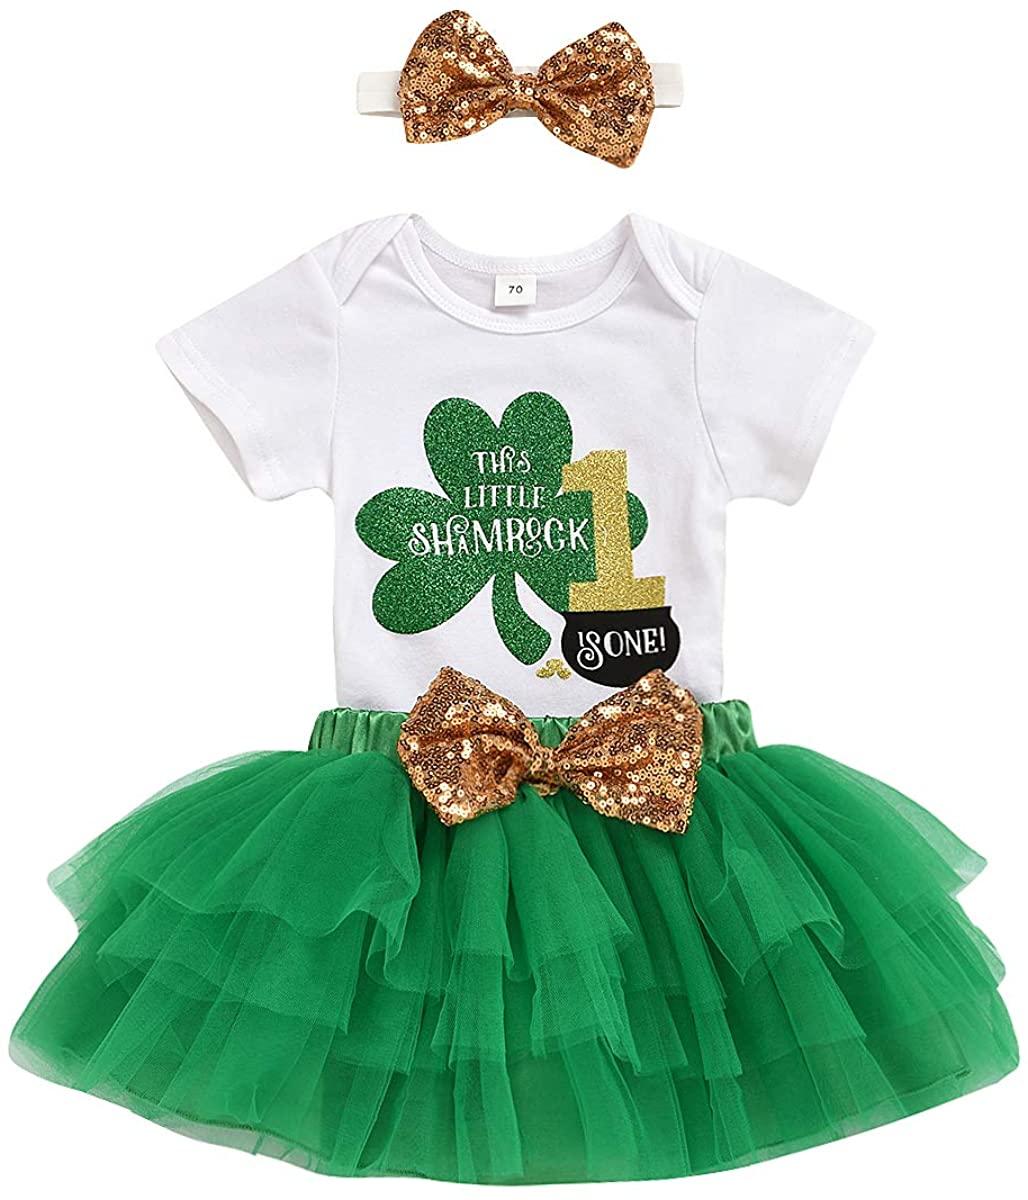 Baby Girls St. Patricks' Day Outfit Shamrock Bodysuit + Tulle Tutu Skirt + Headband + Leg Warmer Clothes Set